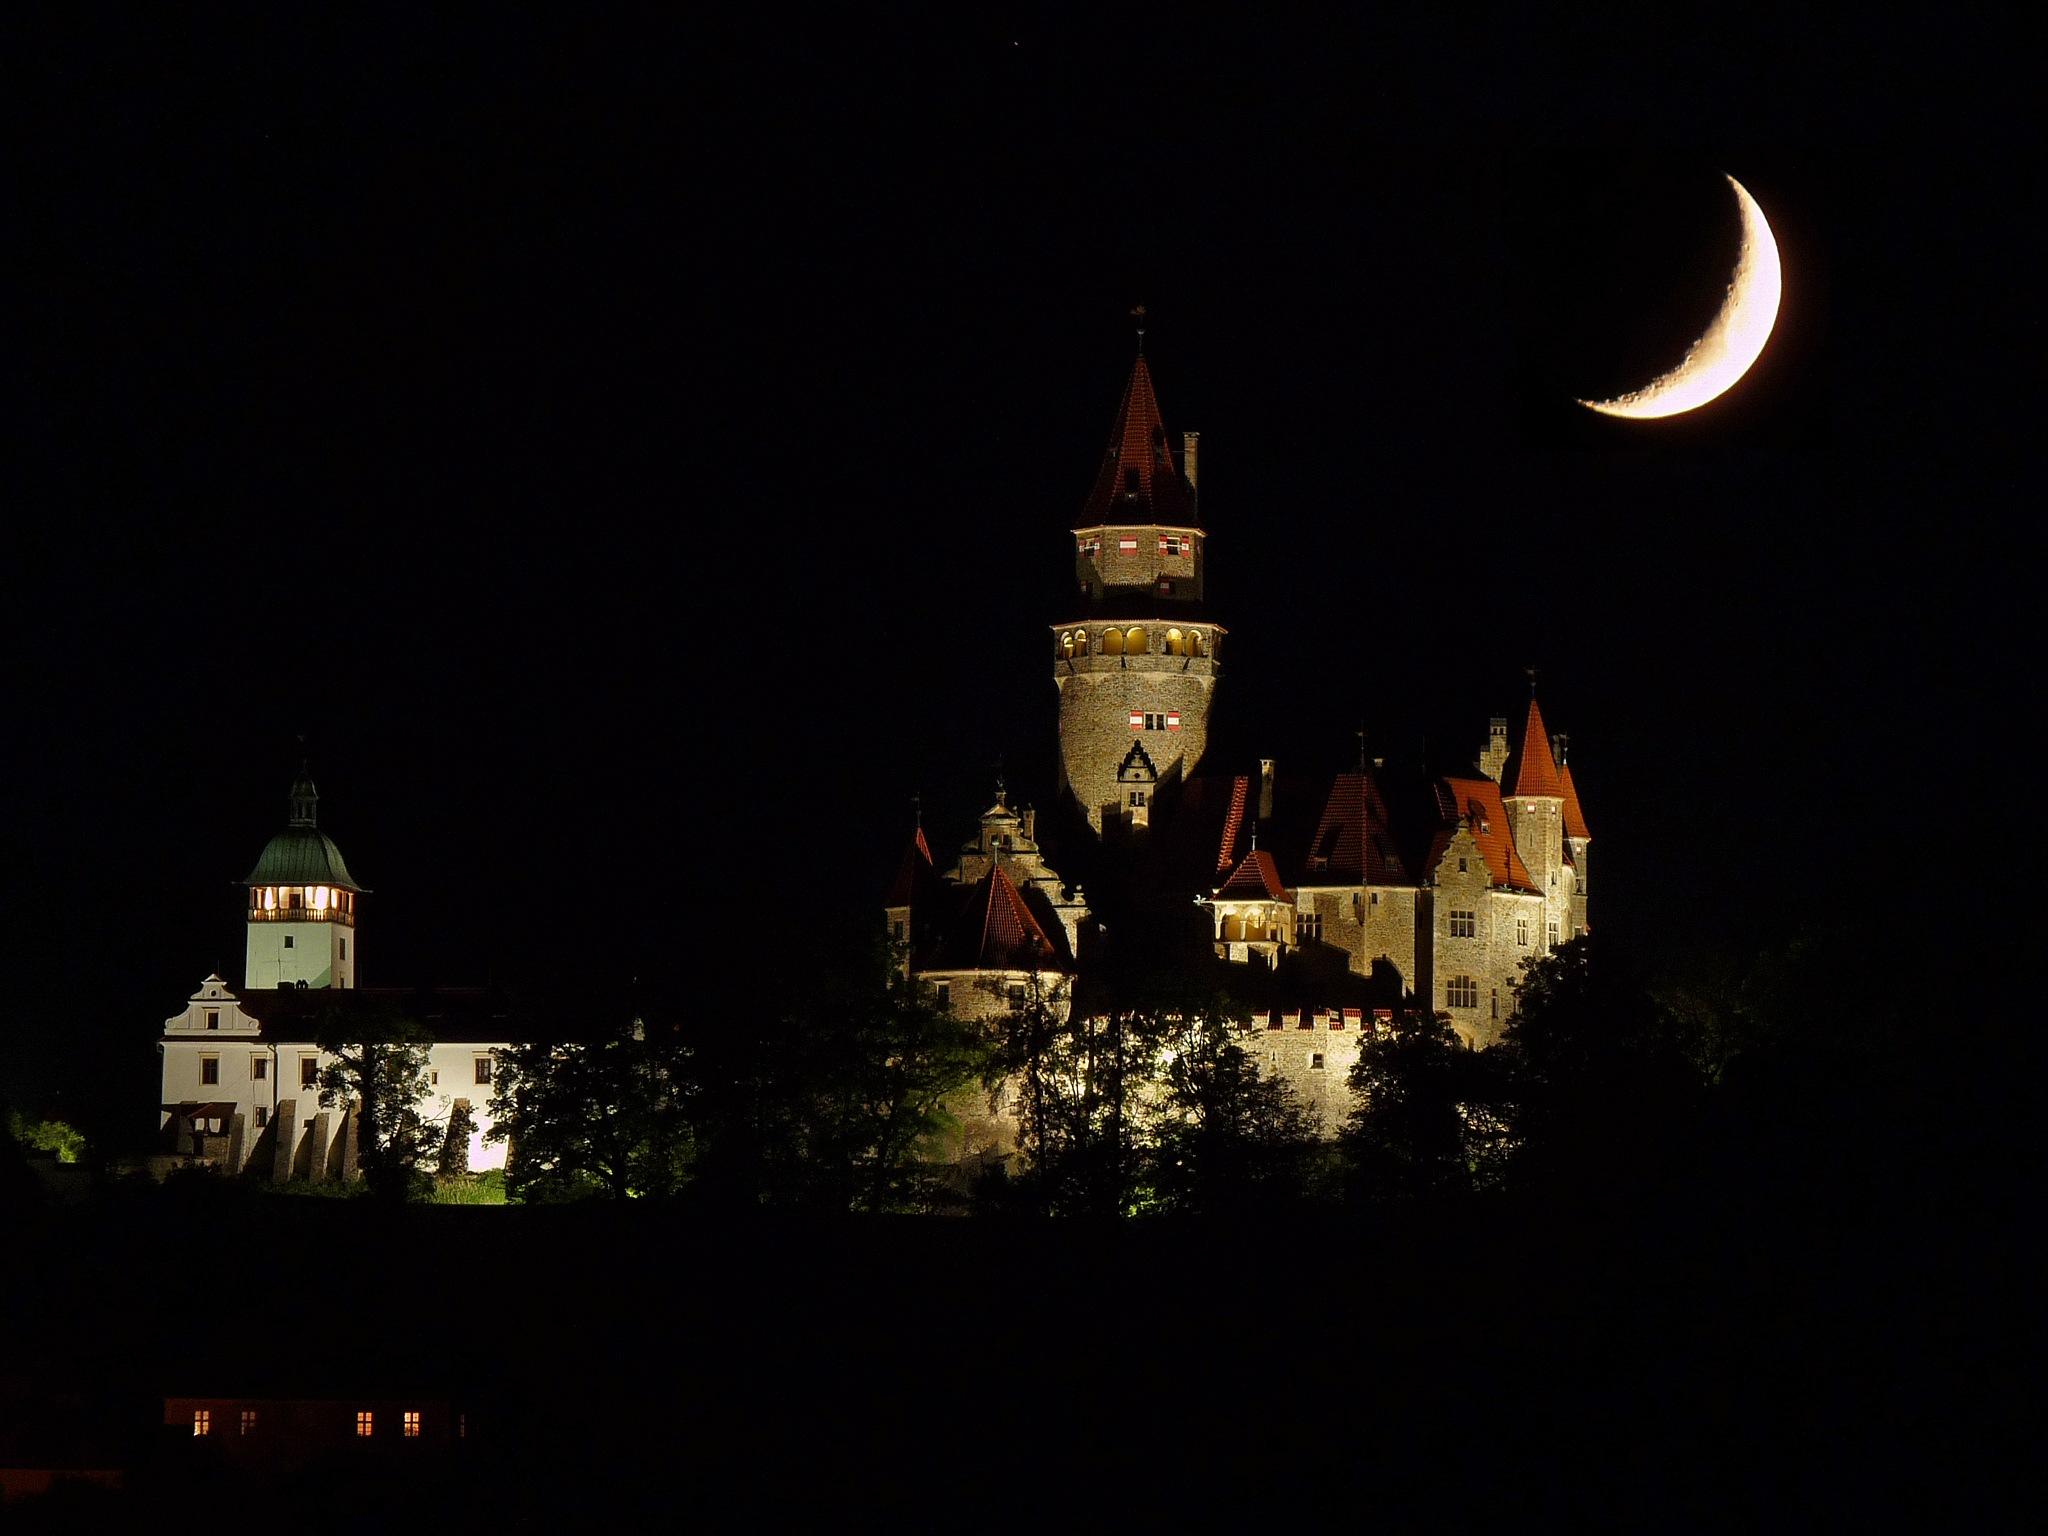 Midnight Castle by Jaroslav Vosáhlo